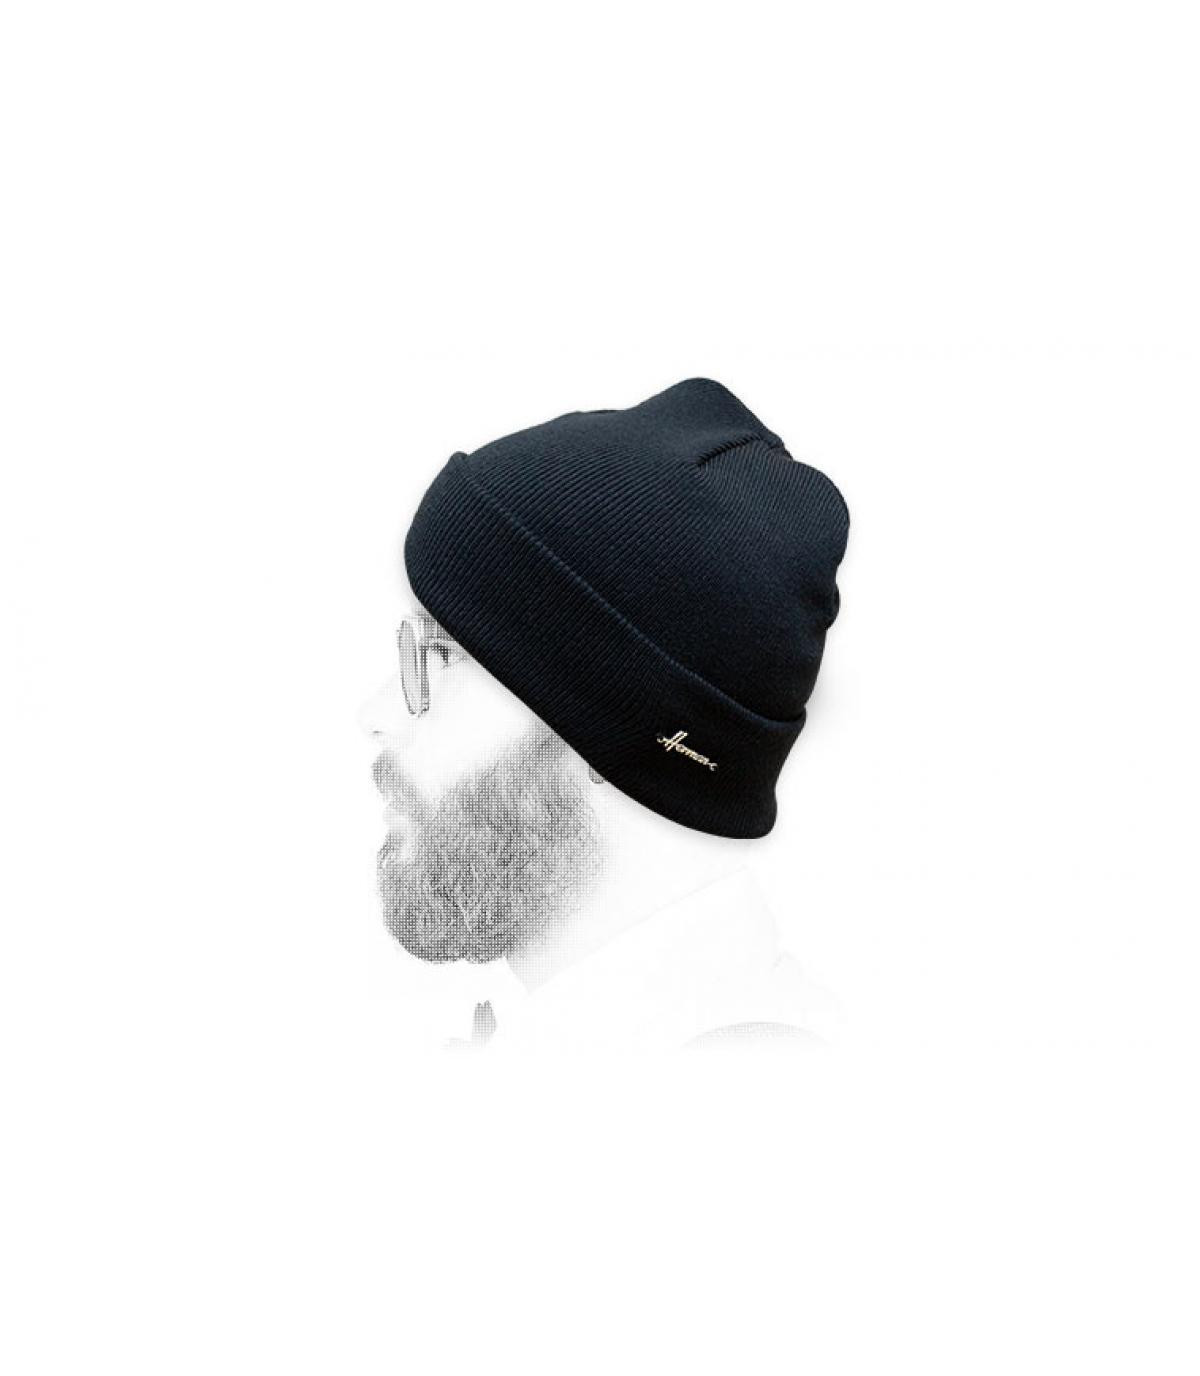 Mütze mit Rand marineblau